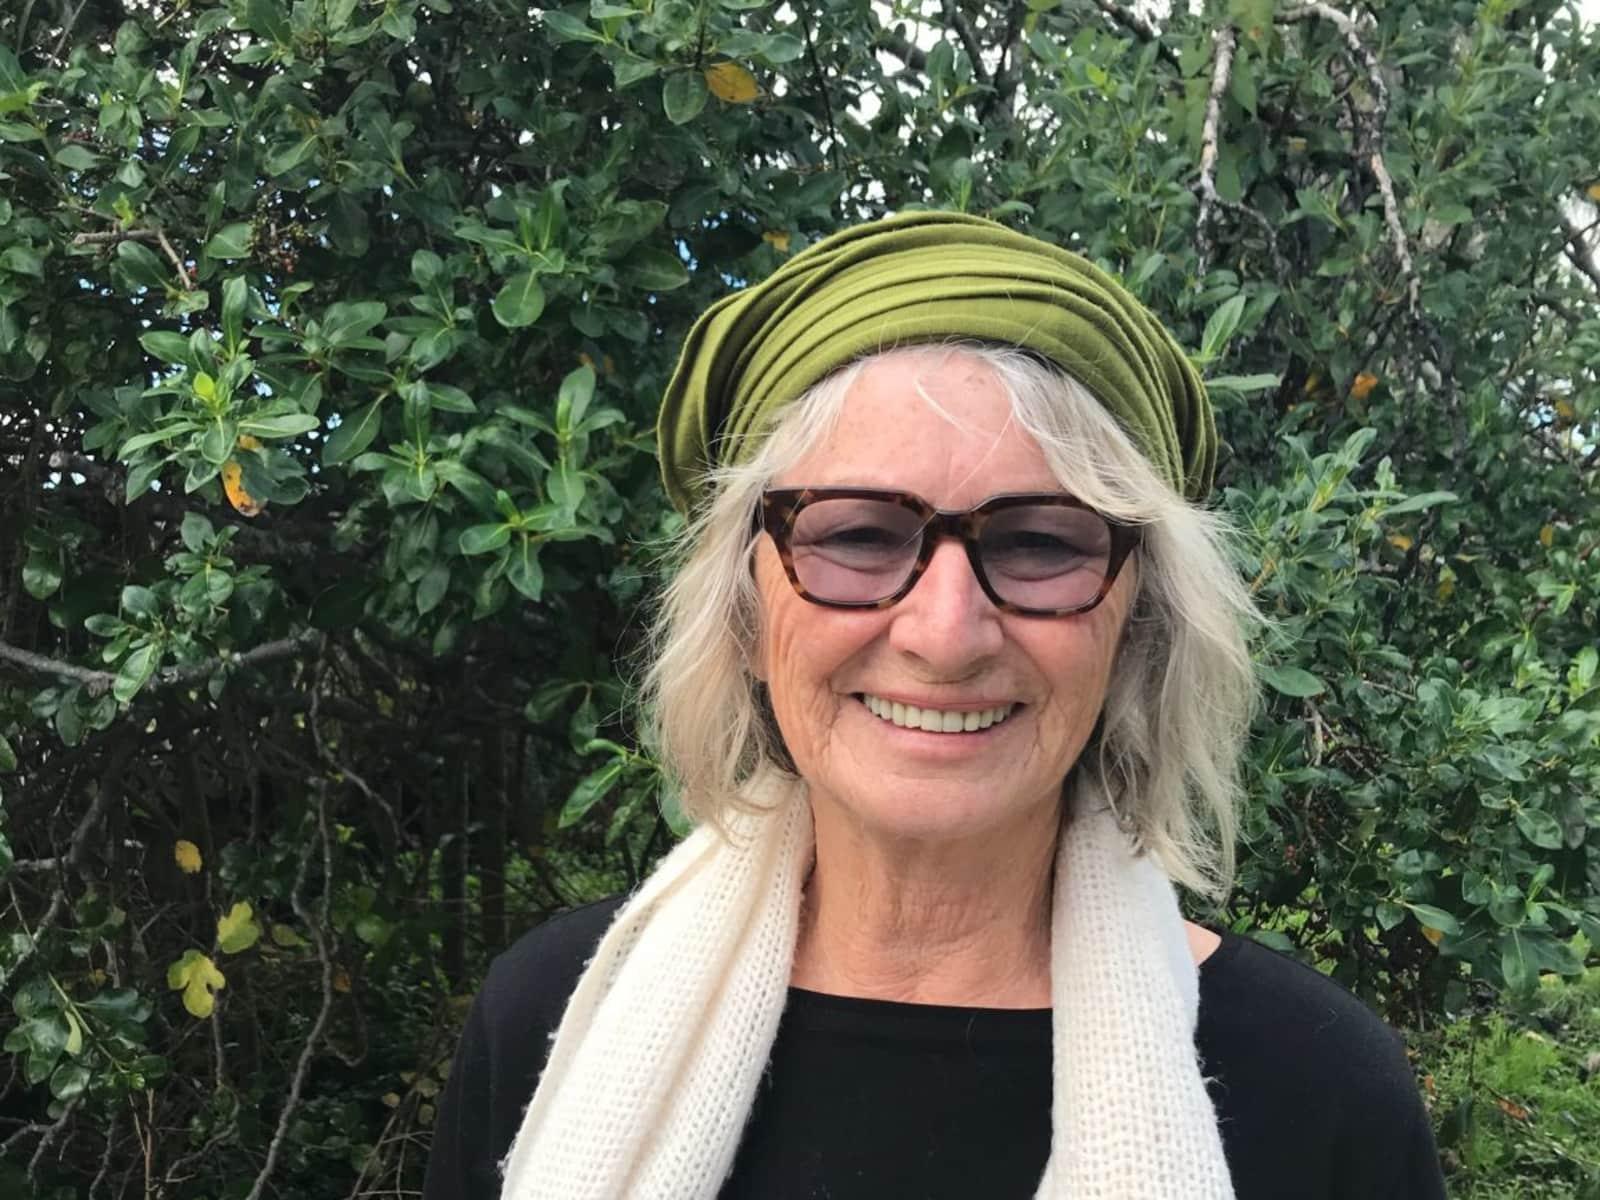 Lynda from Auckland, New Zealand